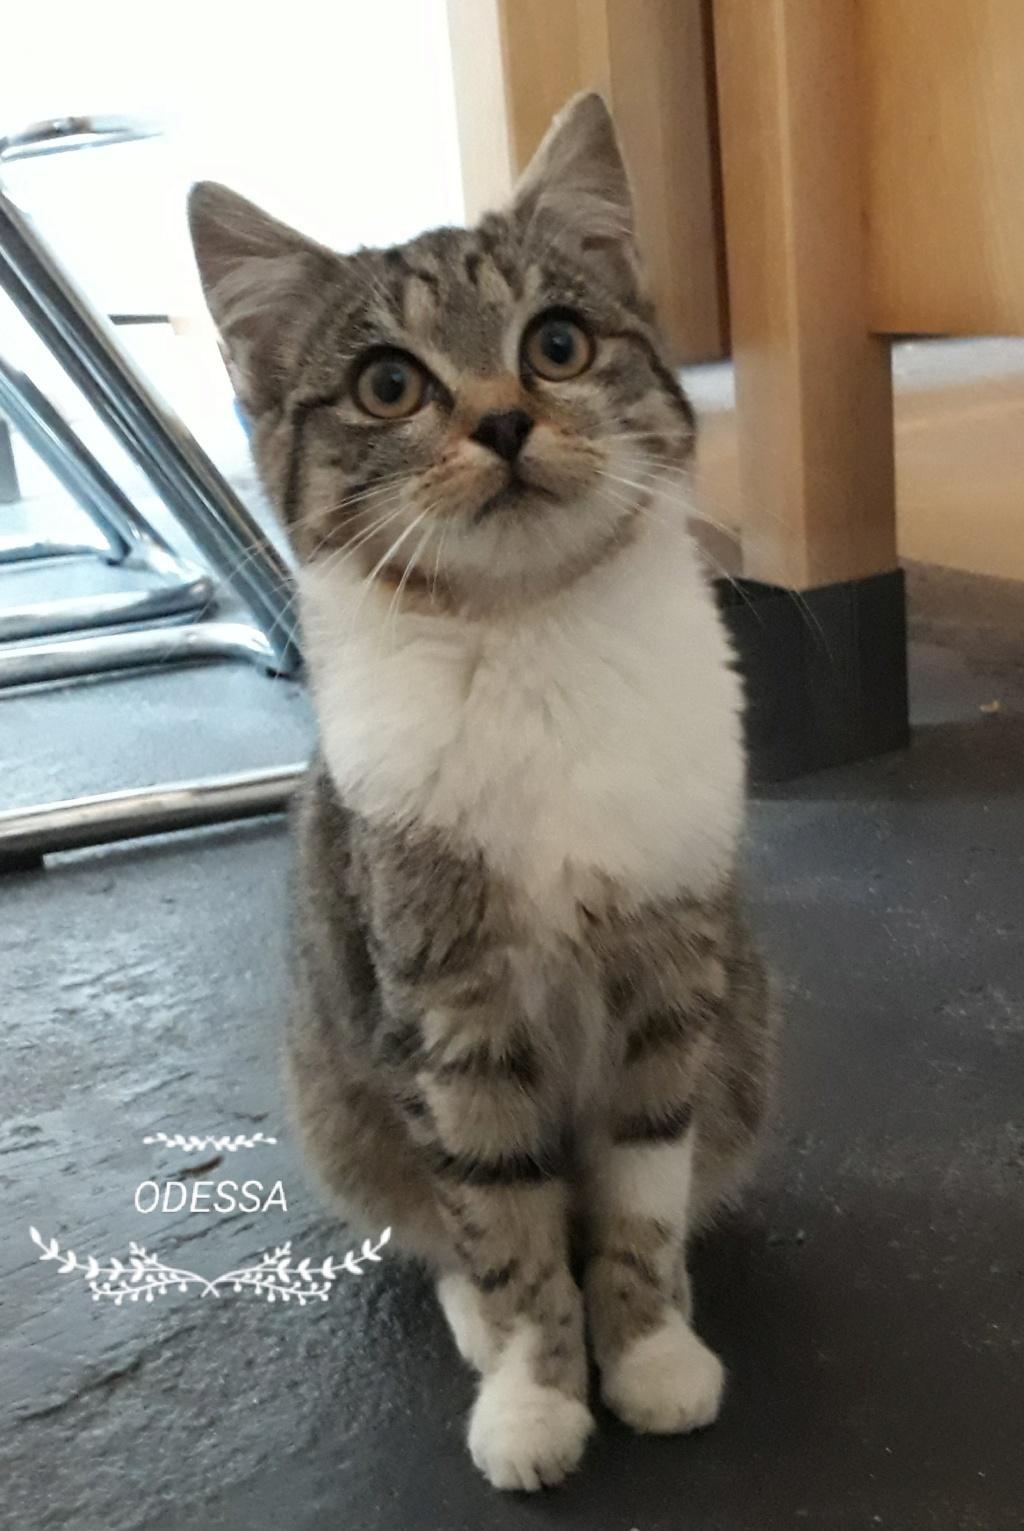 Cracotte ex ODESSA née en août 2018 20181112